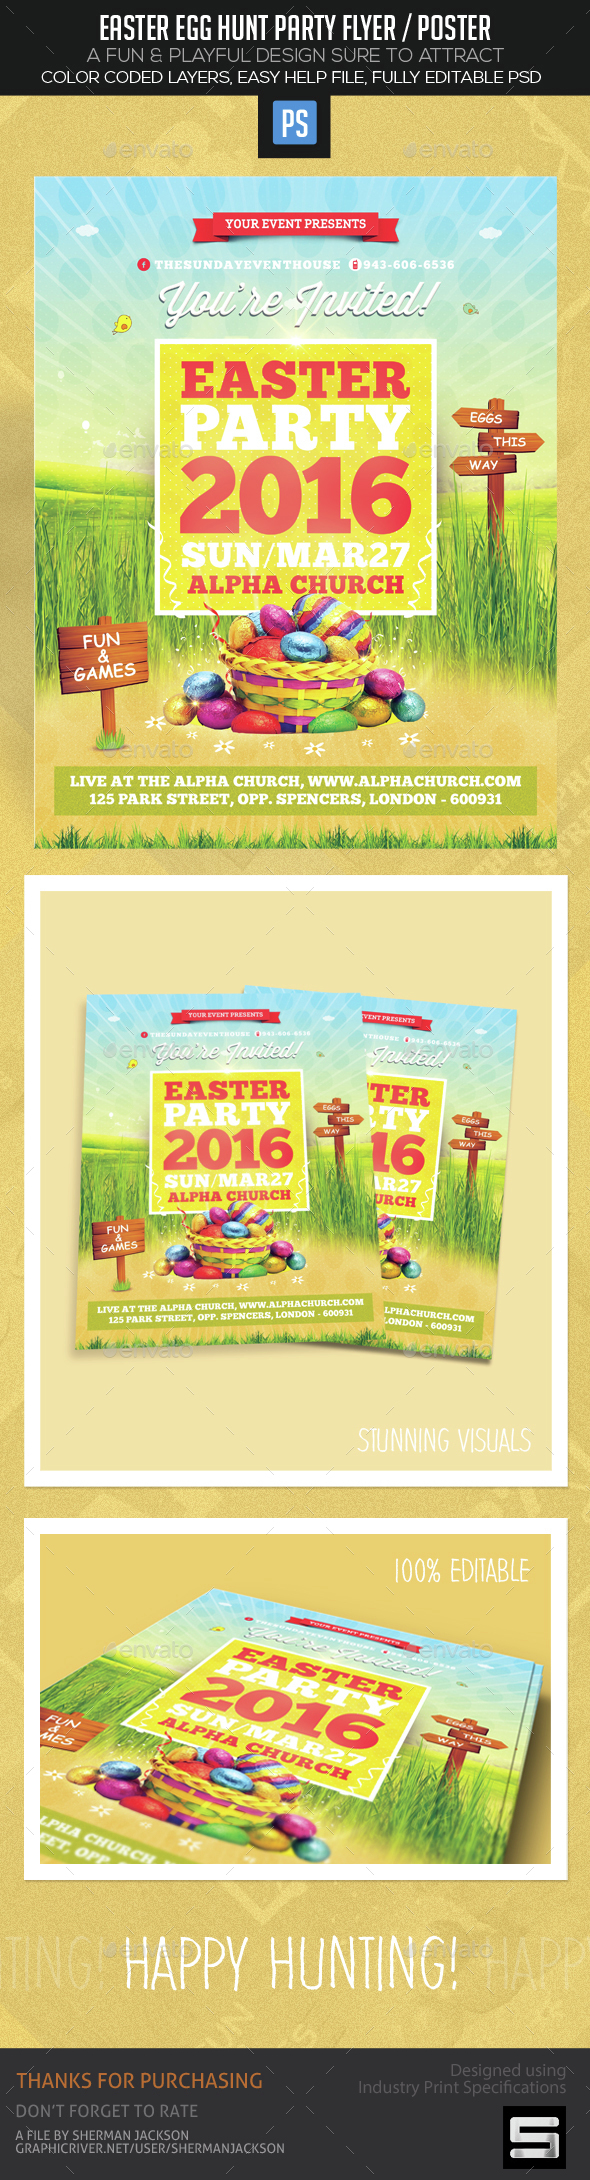 Easter Egg Hunt Party Flyer / Poster - Events Flyers